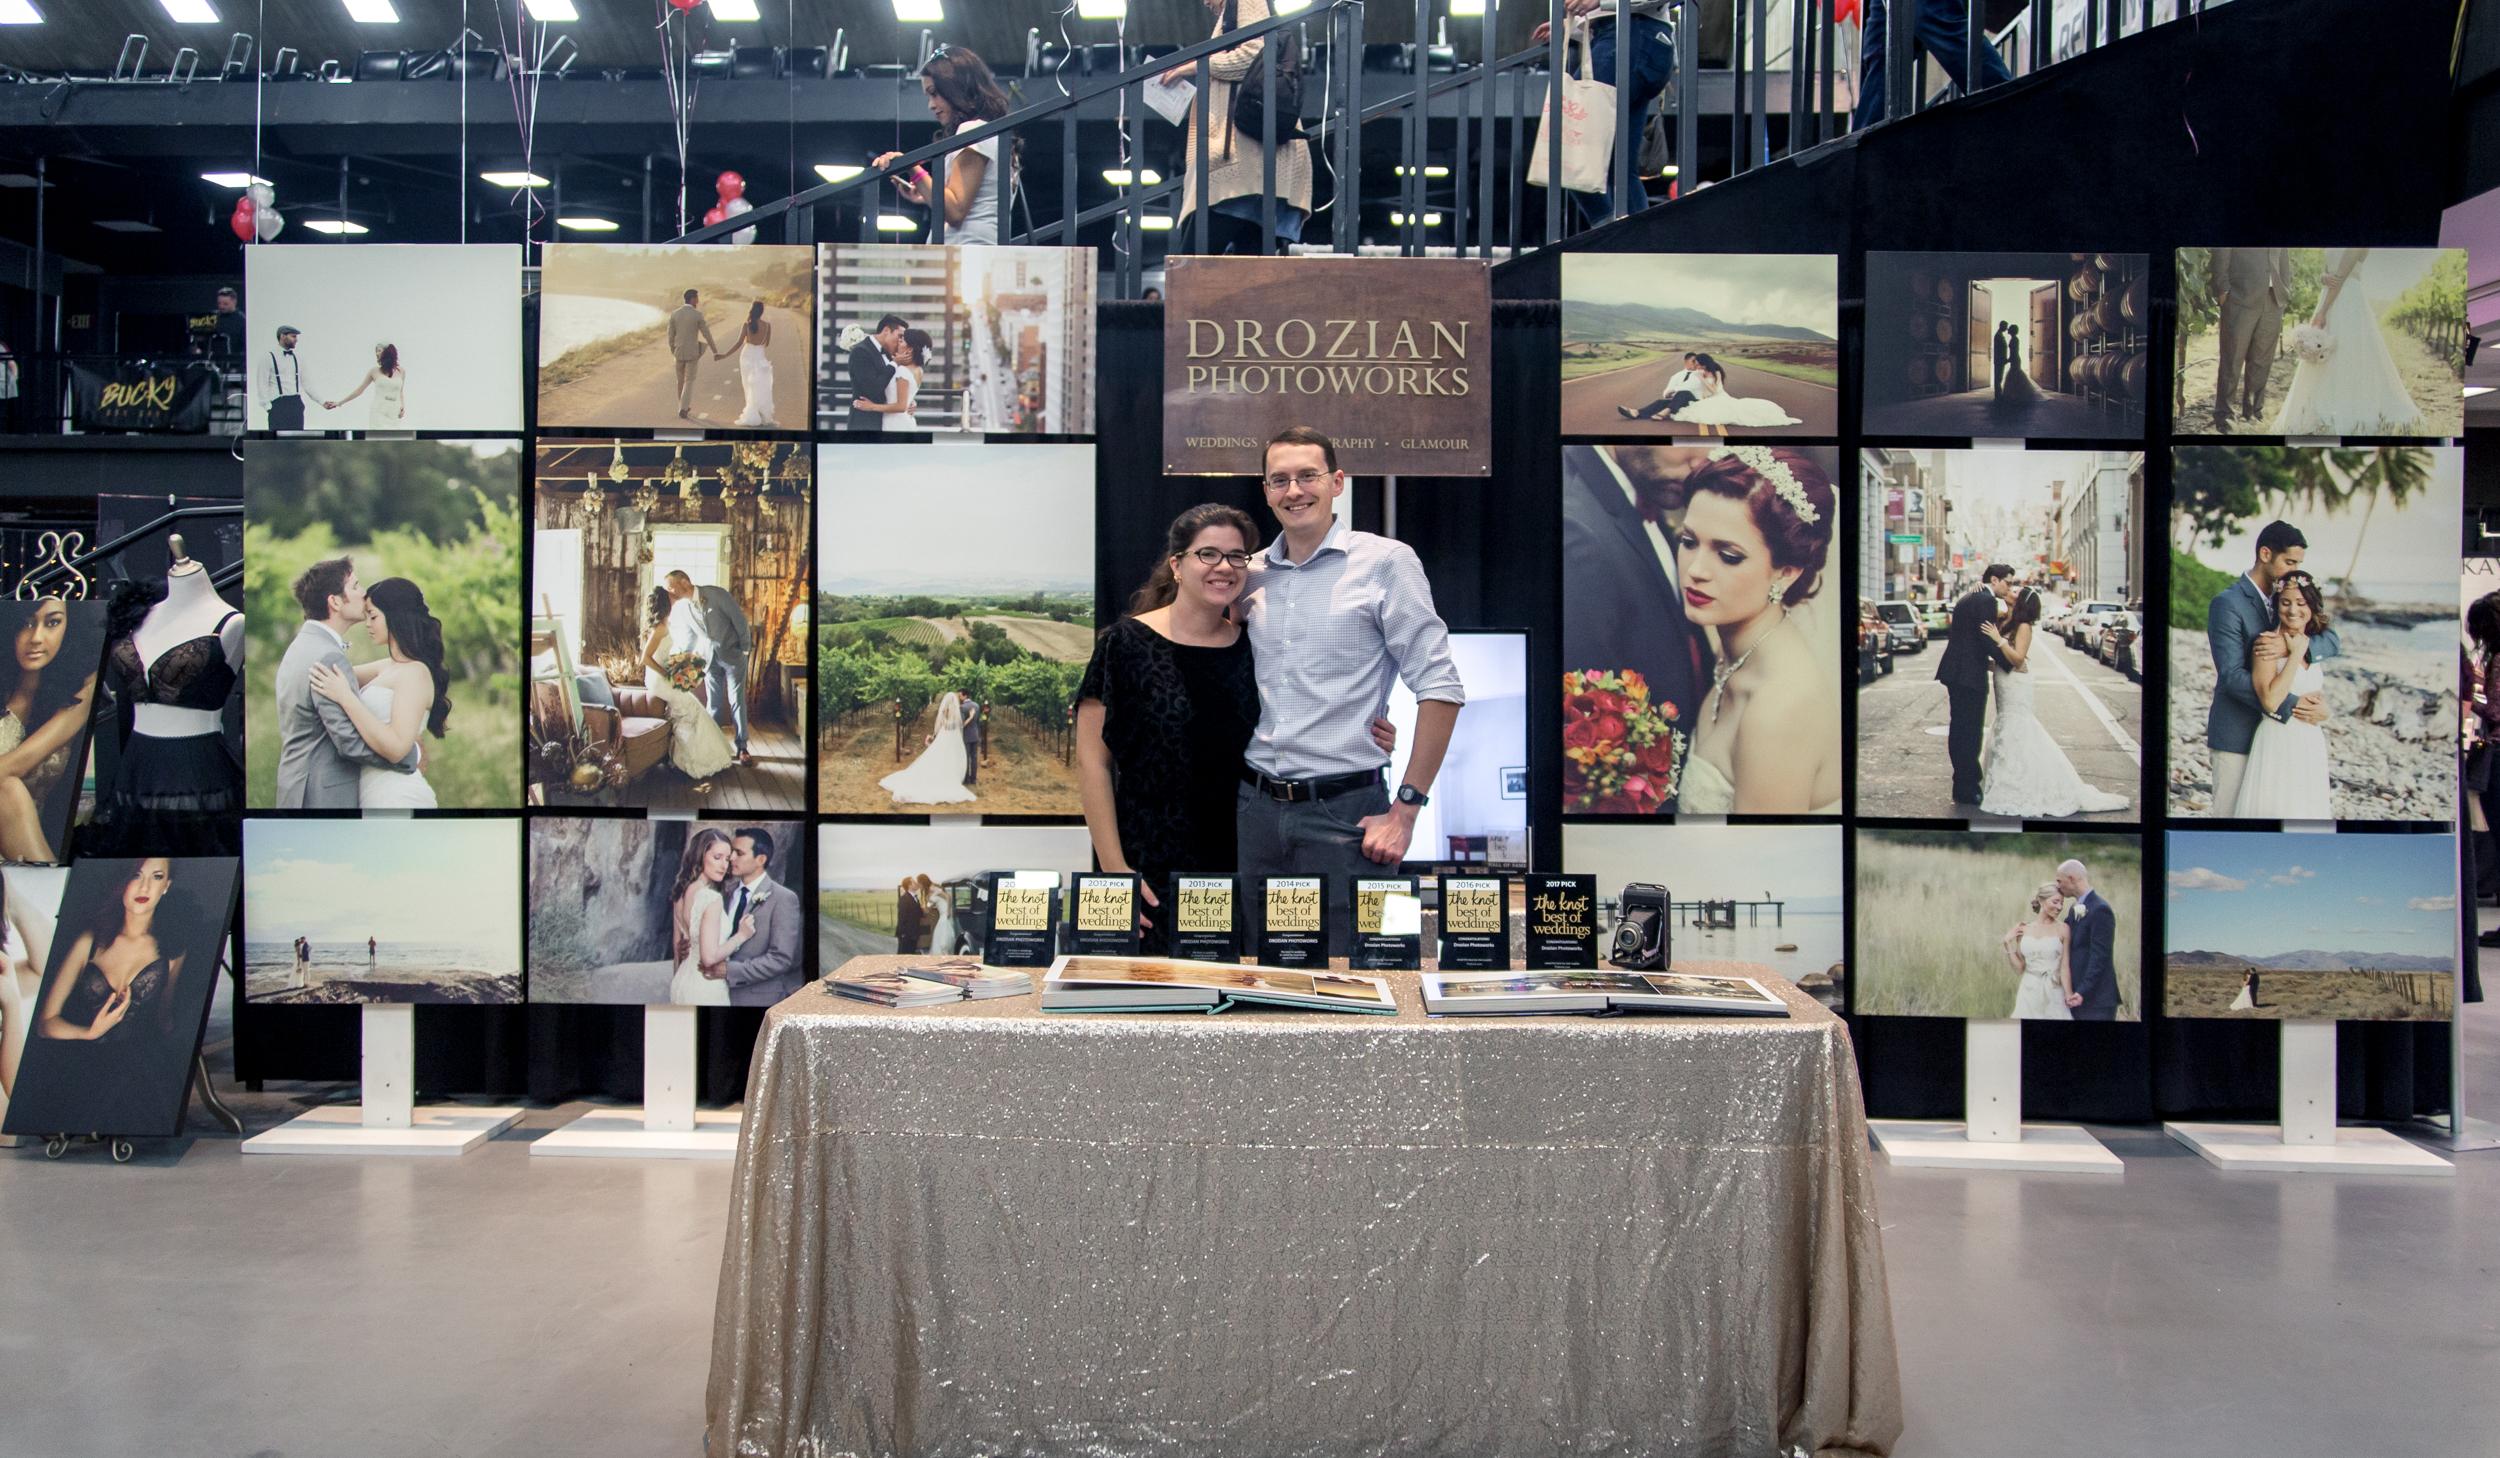 Drozian Photoworks Redding Bridal Show Wedding Expo